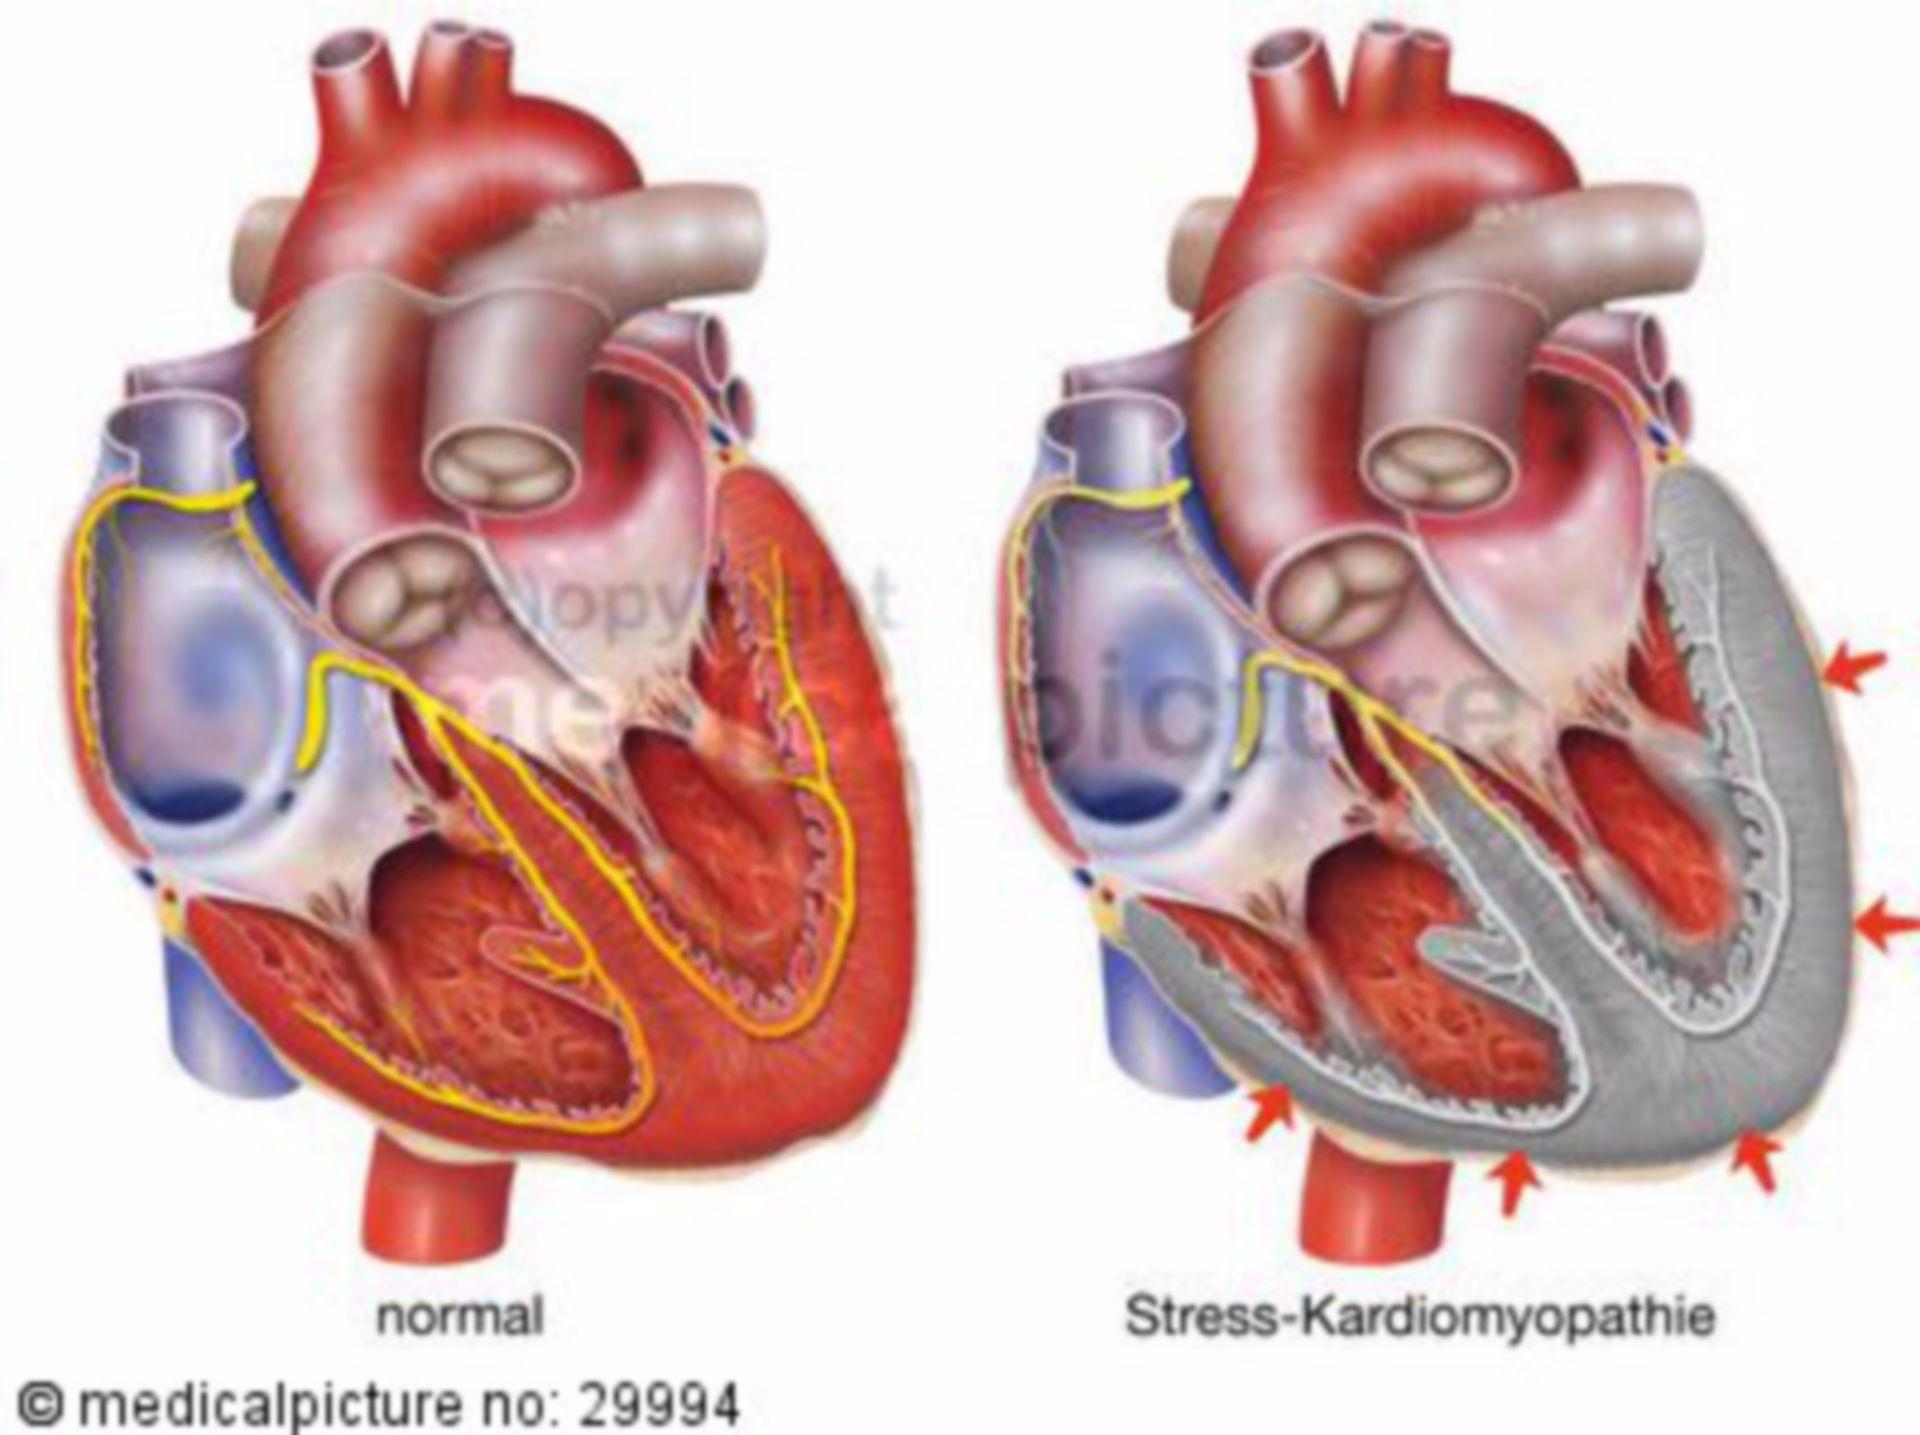 Lo stress cardiomiopatia